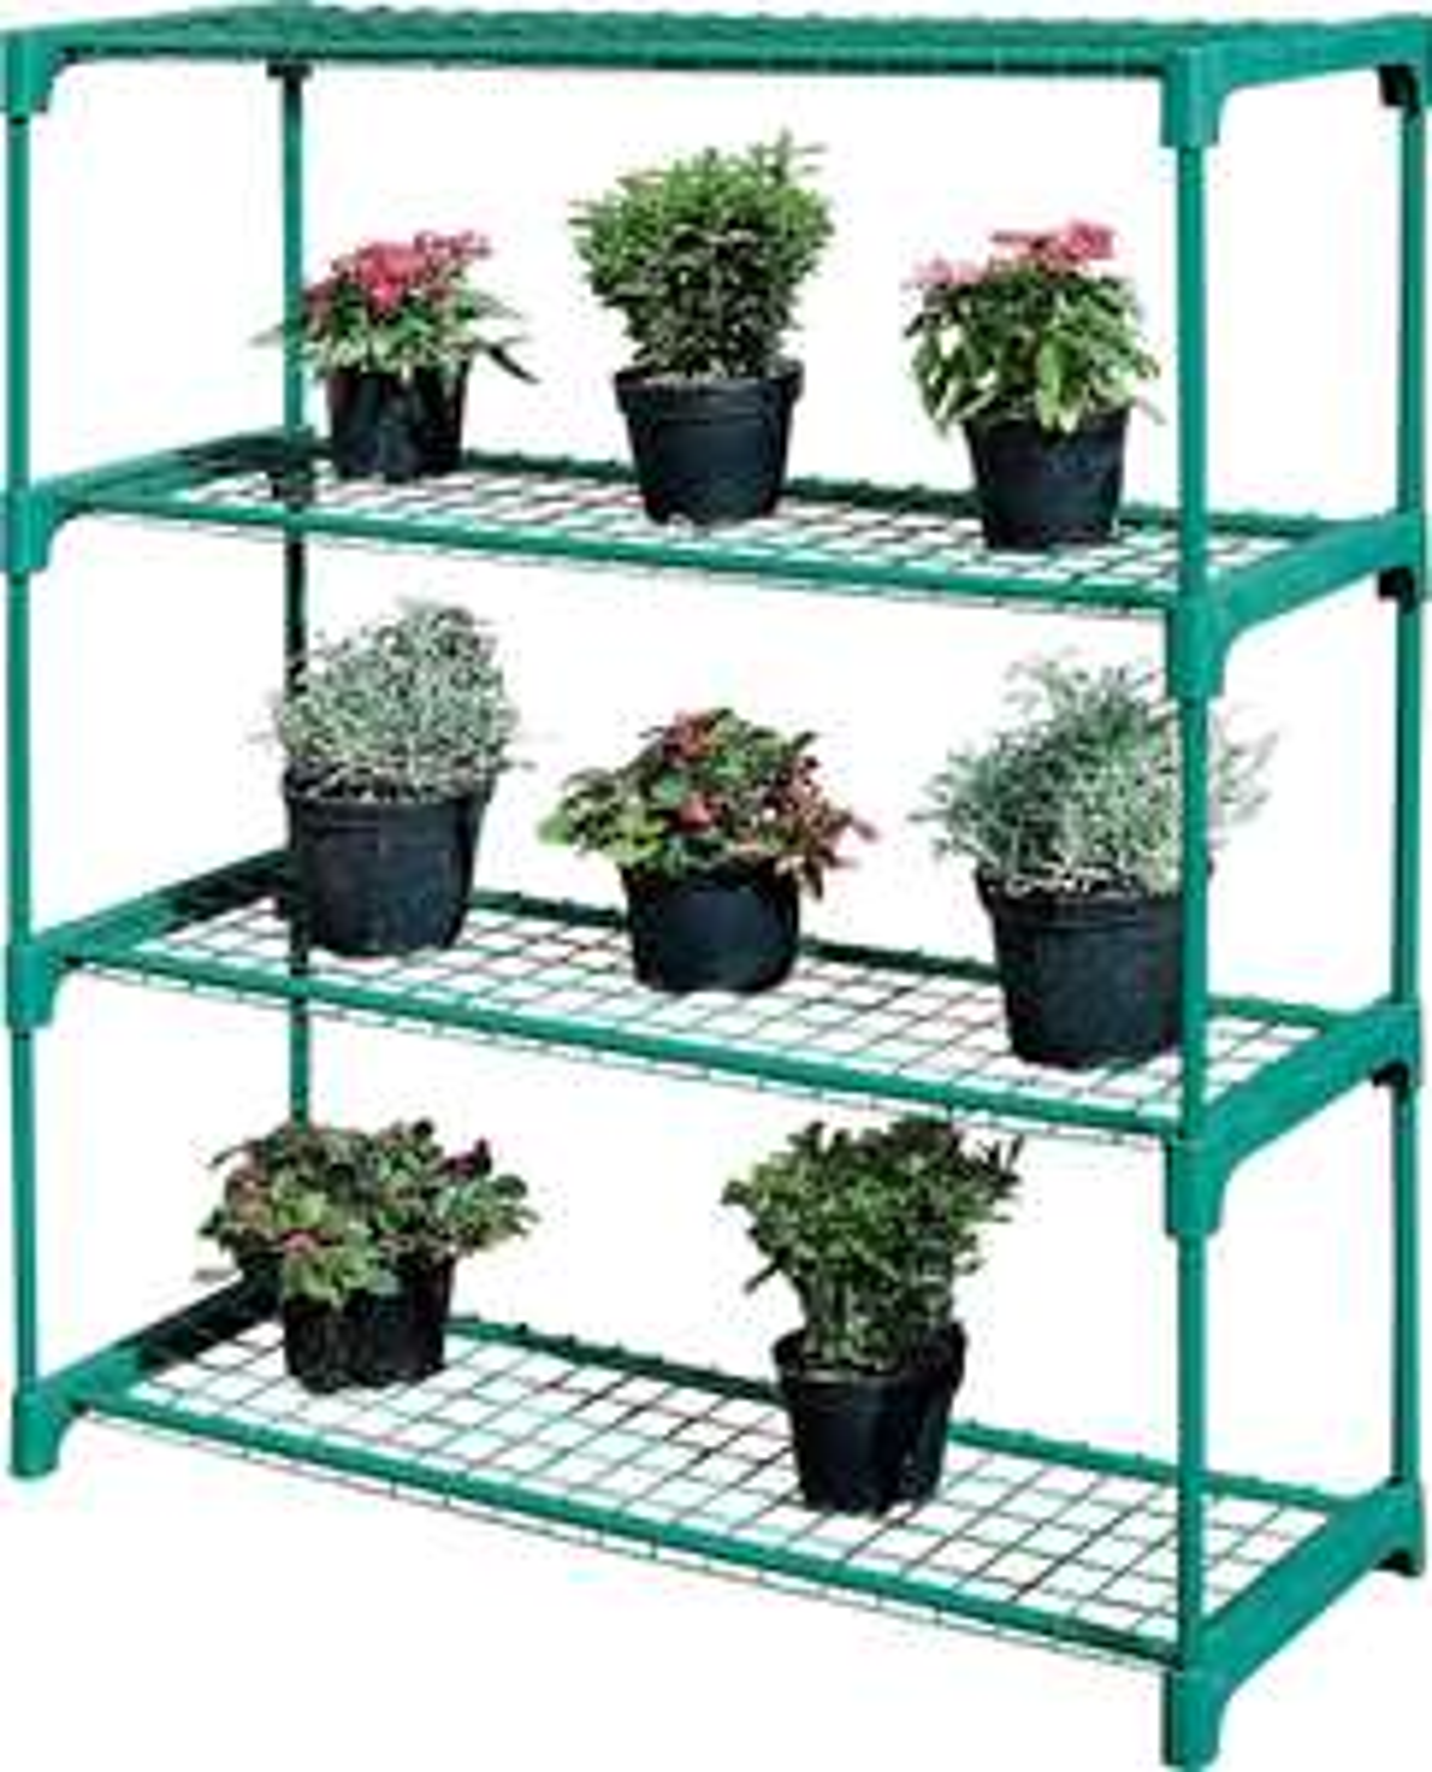 4 Shelf Tubular Greenhouse Shelving x 2 £7.24 @ Argos - Free (C&C)